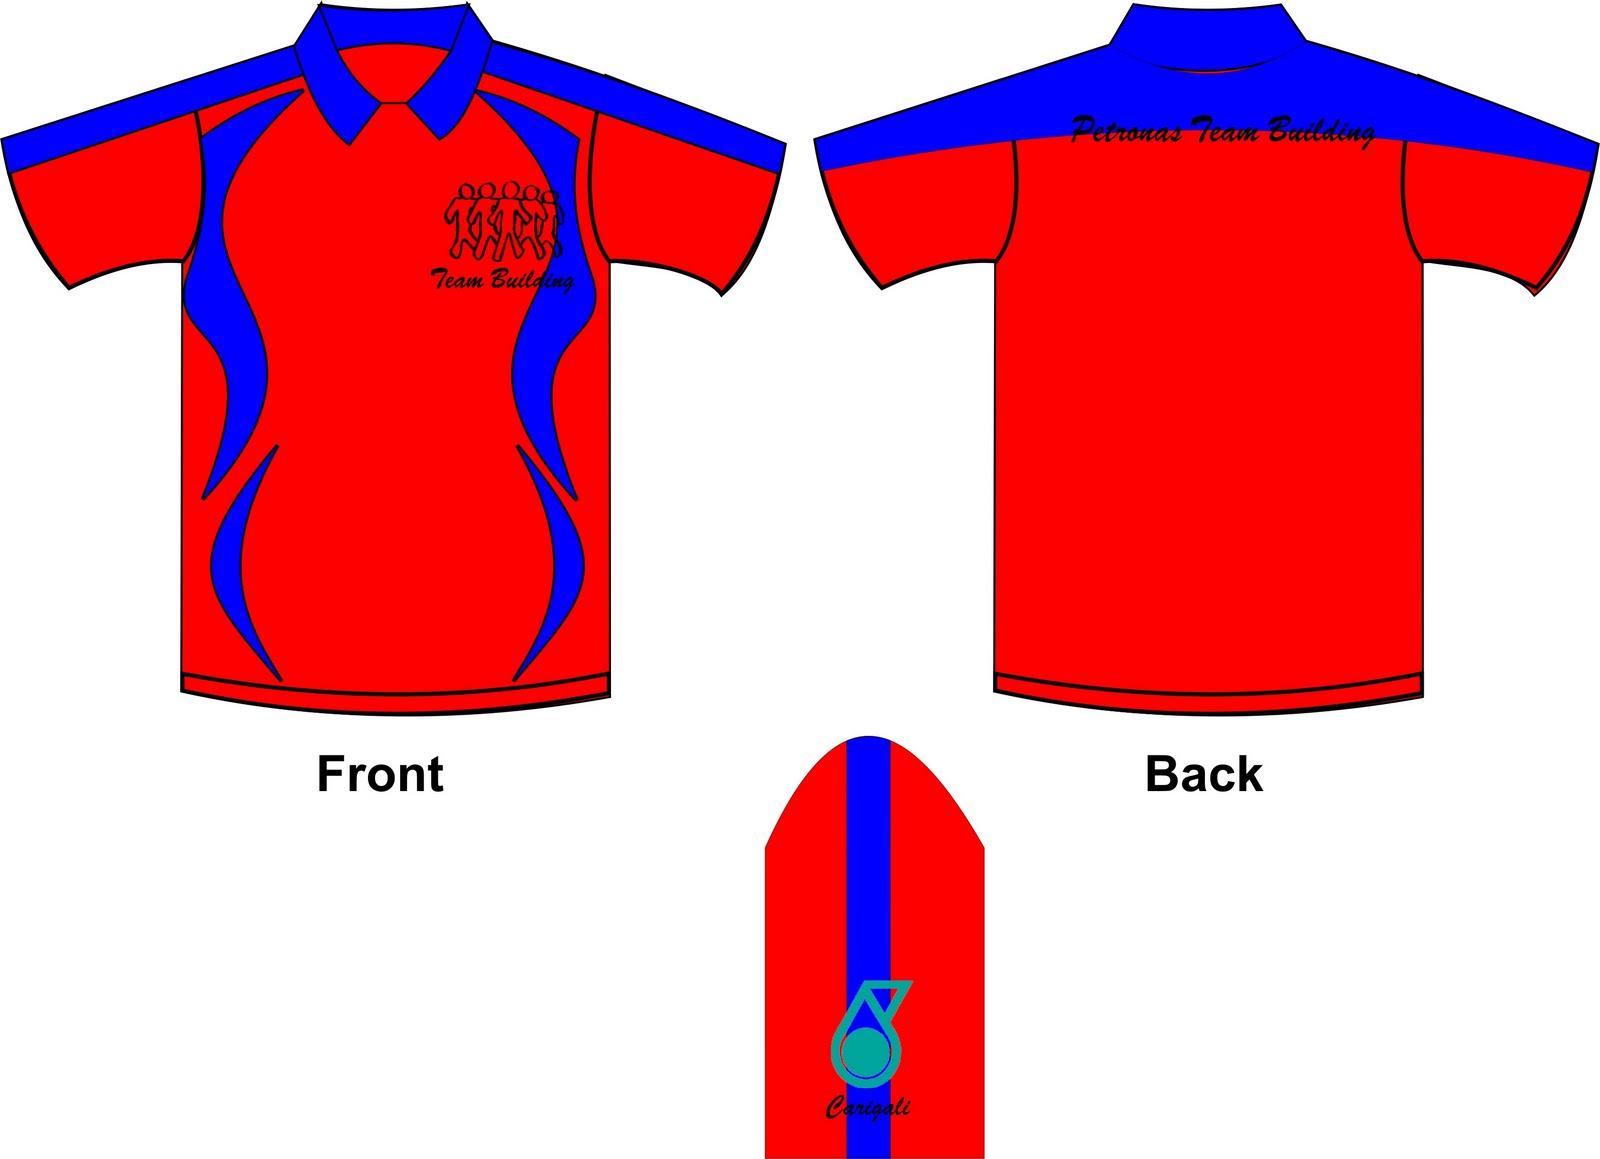 Design baju t shirt kelas - Contoh Design Baju T Shirt